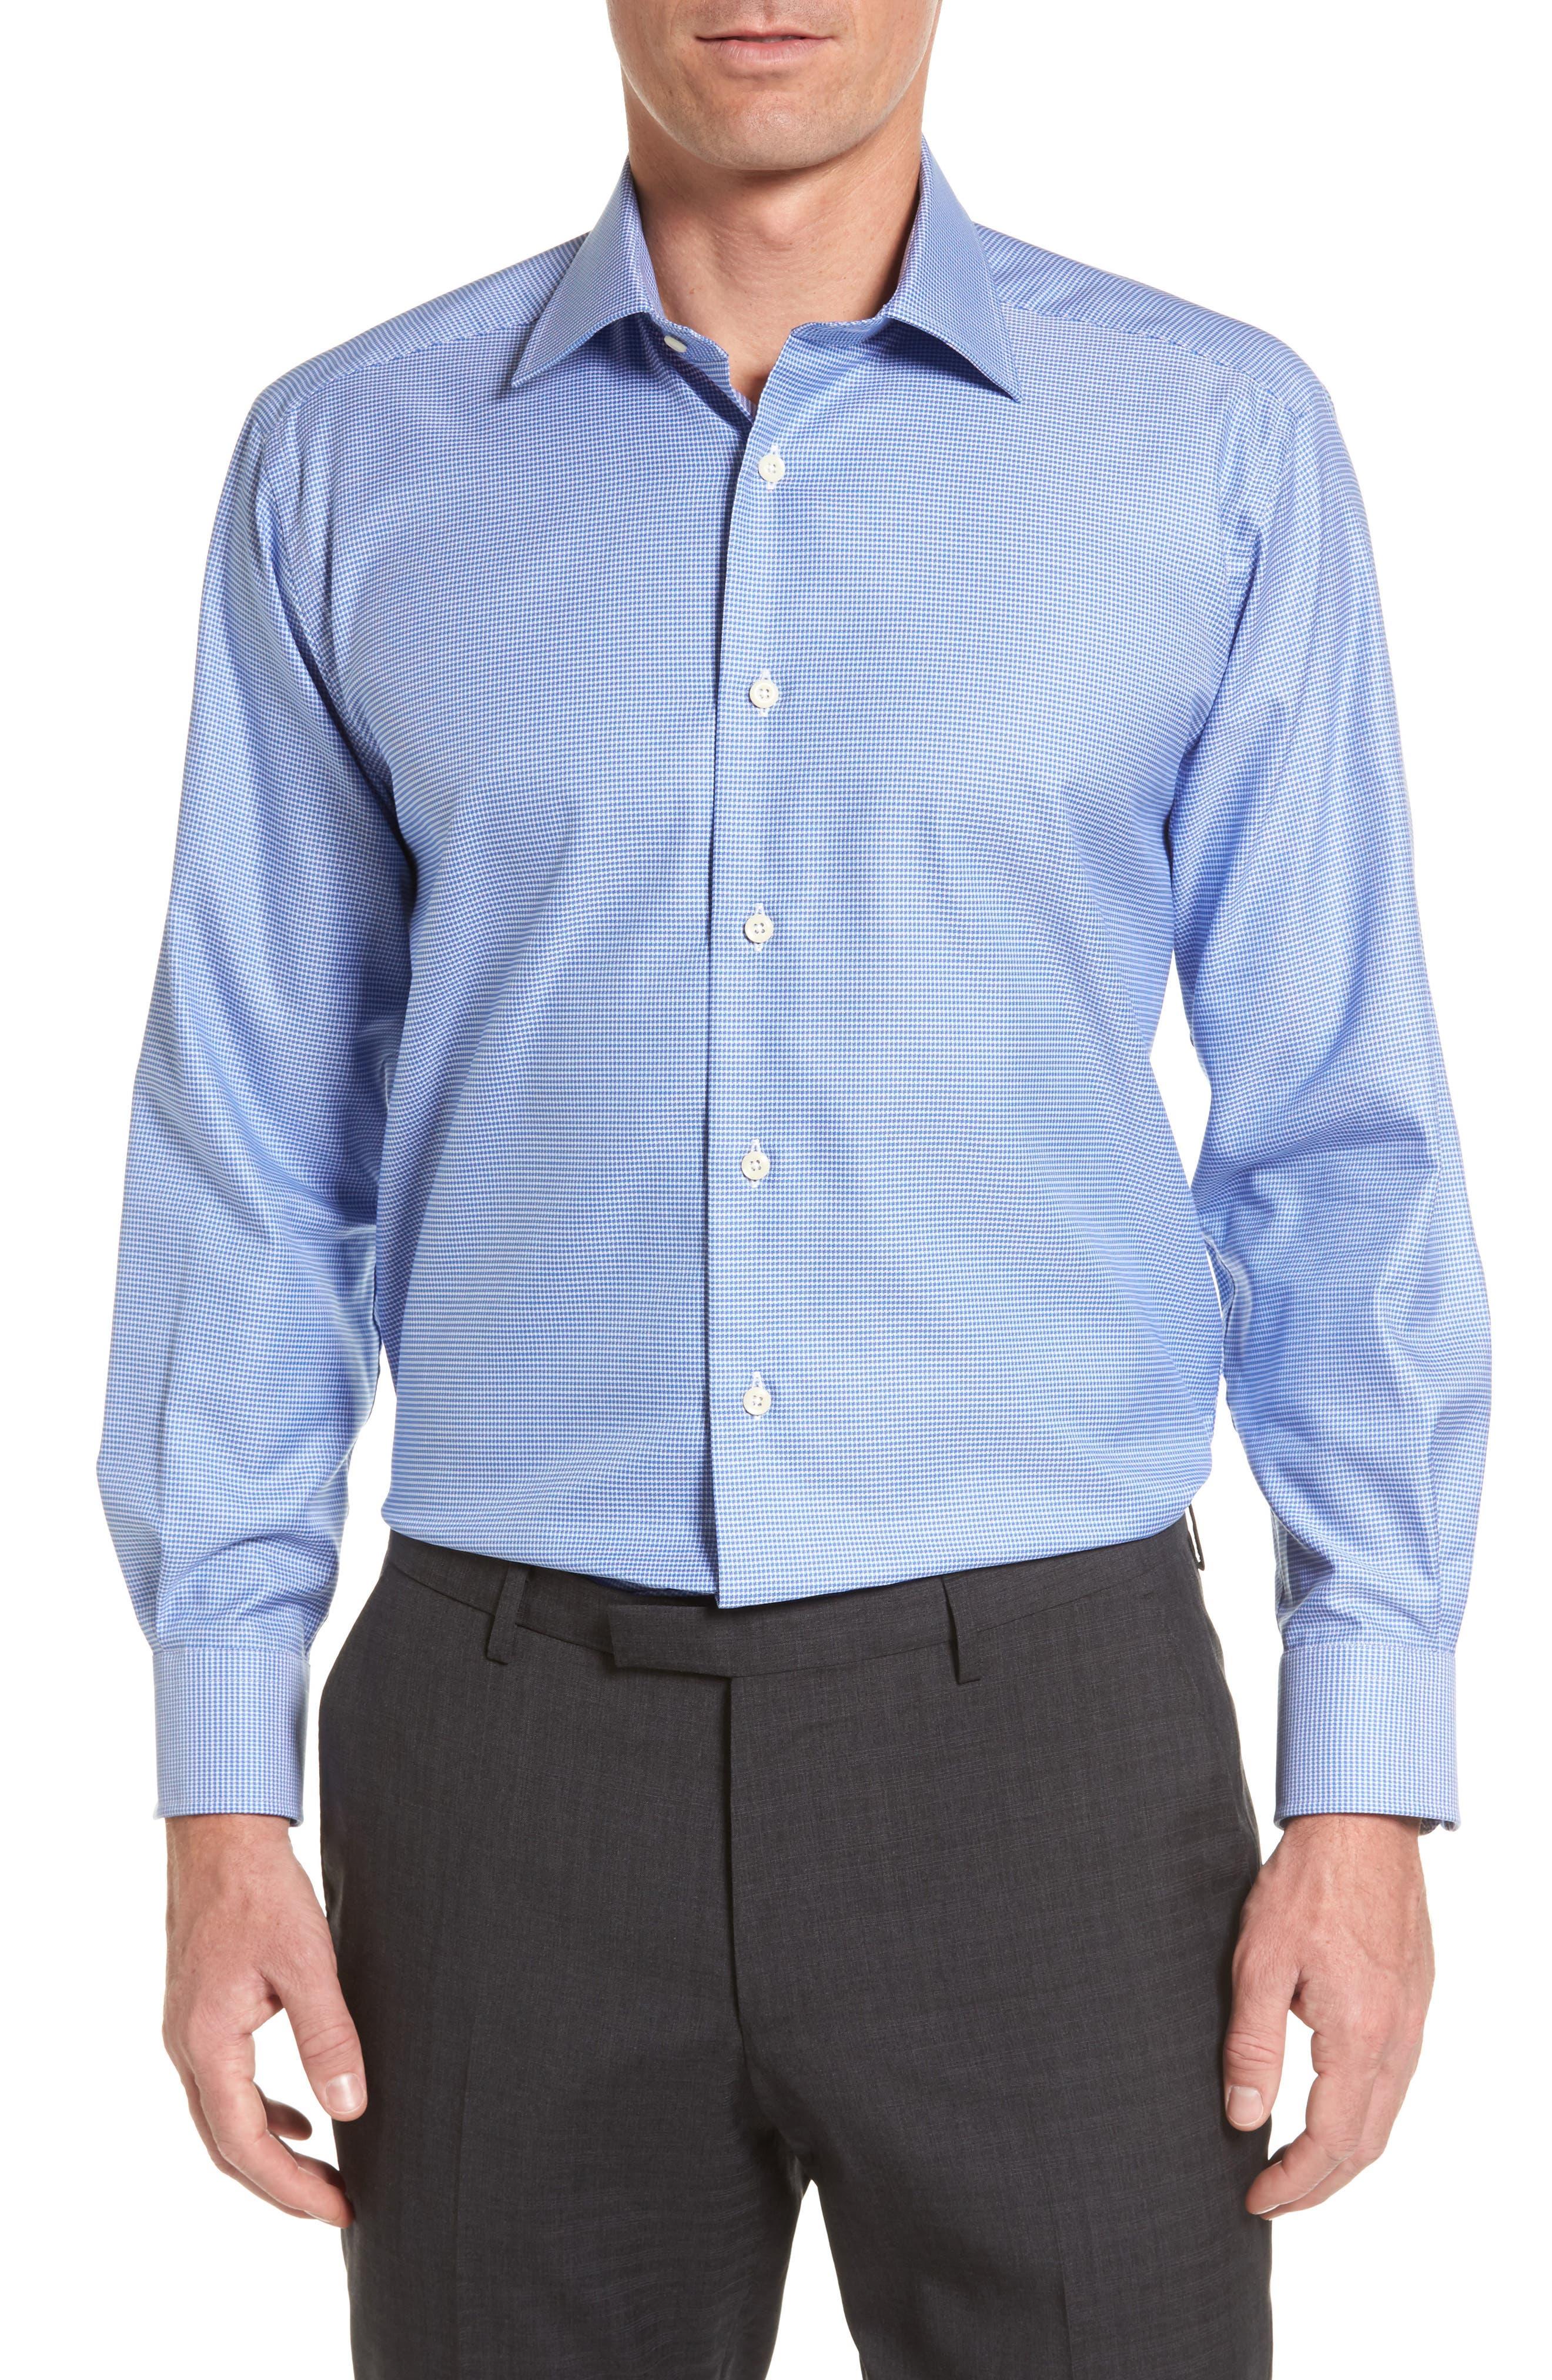 Alternate Image 1 Selected - David Donahue Regular Fit Houndstooth Dress Shirt